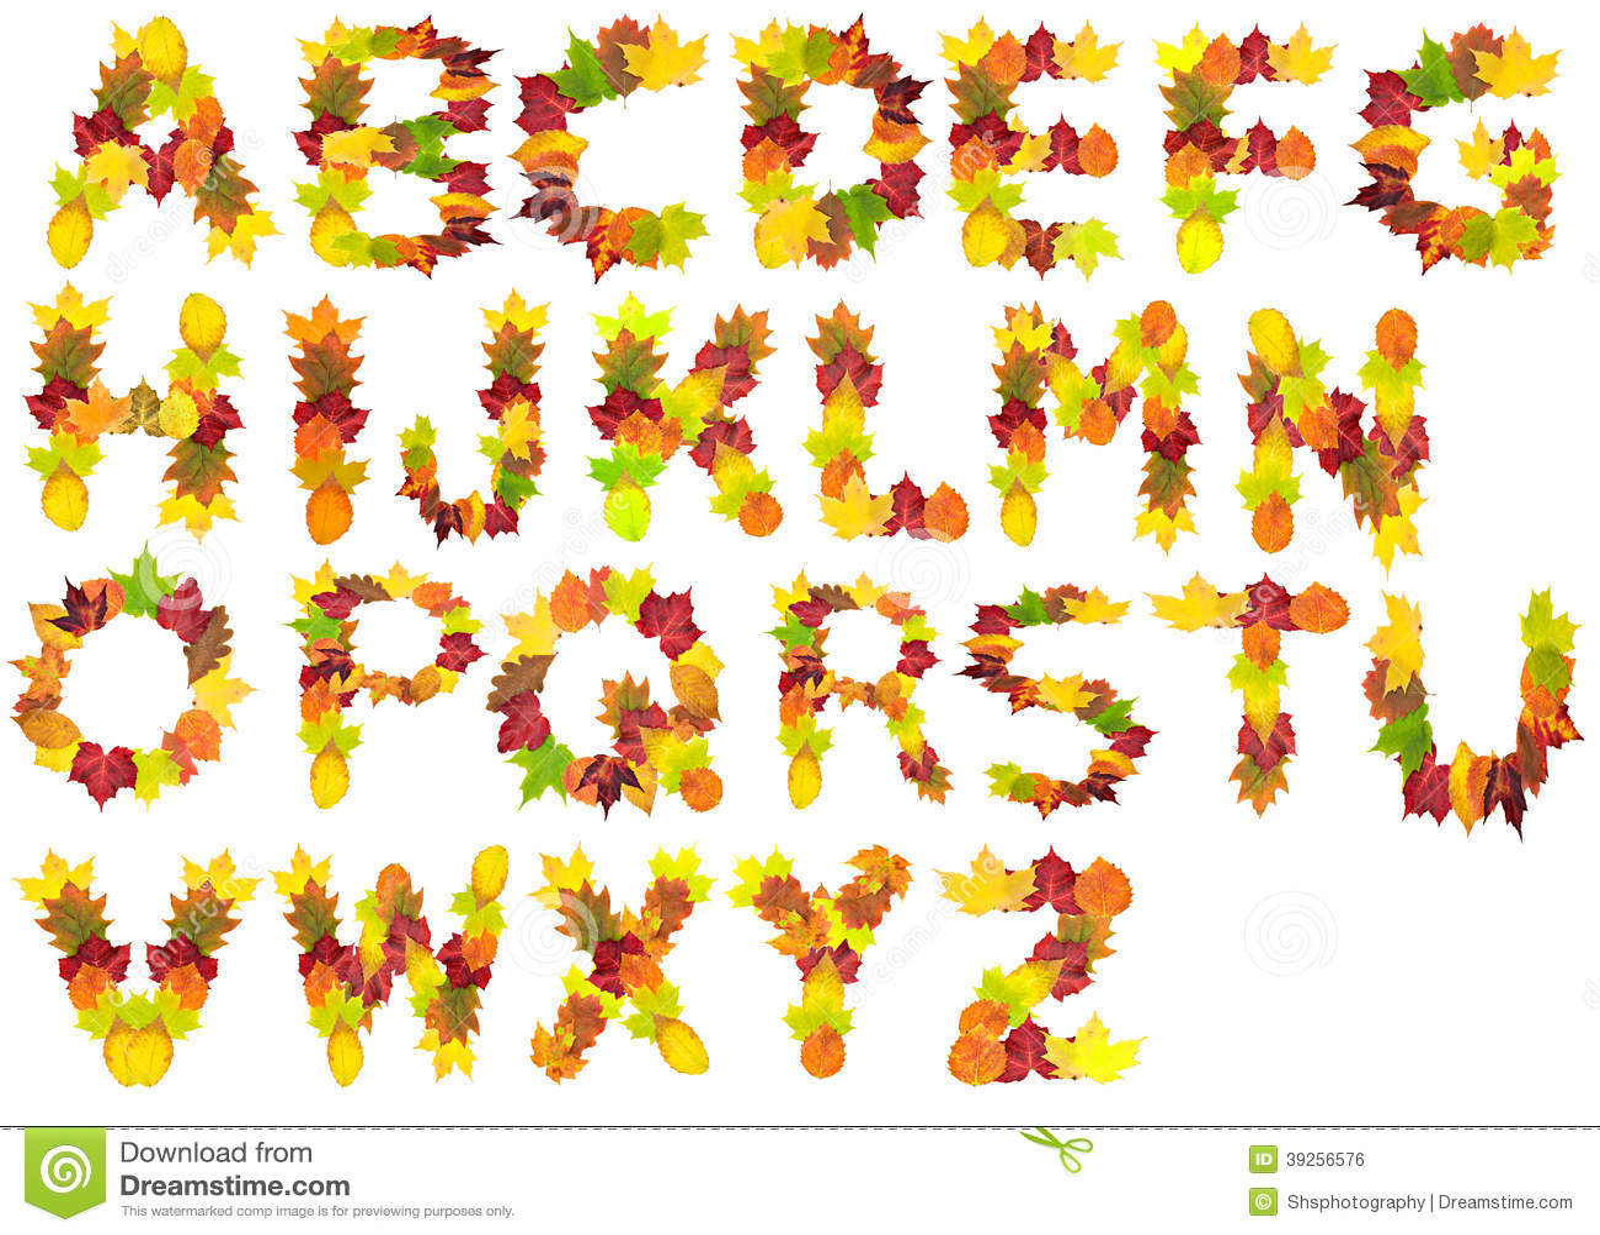 autumn leaf alphabet stock photo image of autumn  poplar birch tree vector pattern birch tree silhouette vector